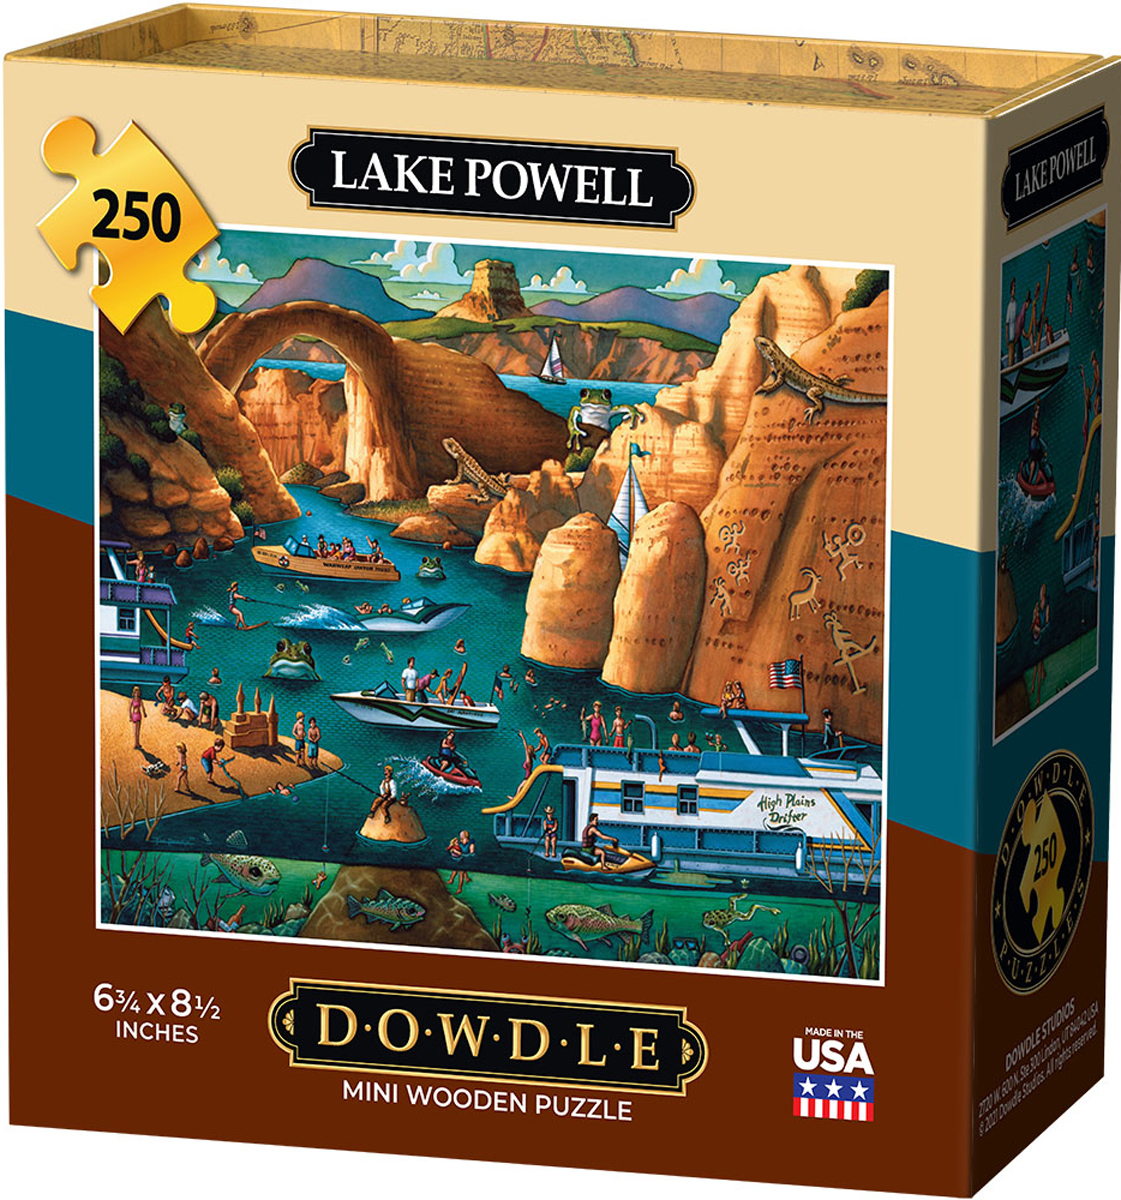 Lake Powell Lakes / Rivers / Streams Jigsaw Puzzle